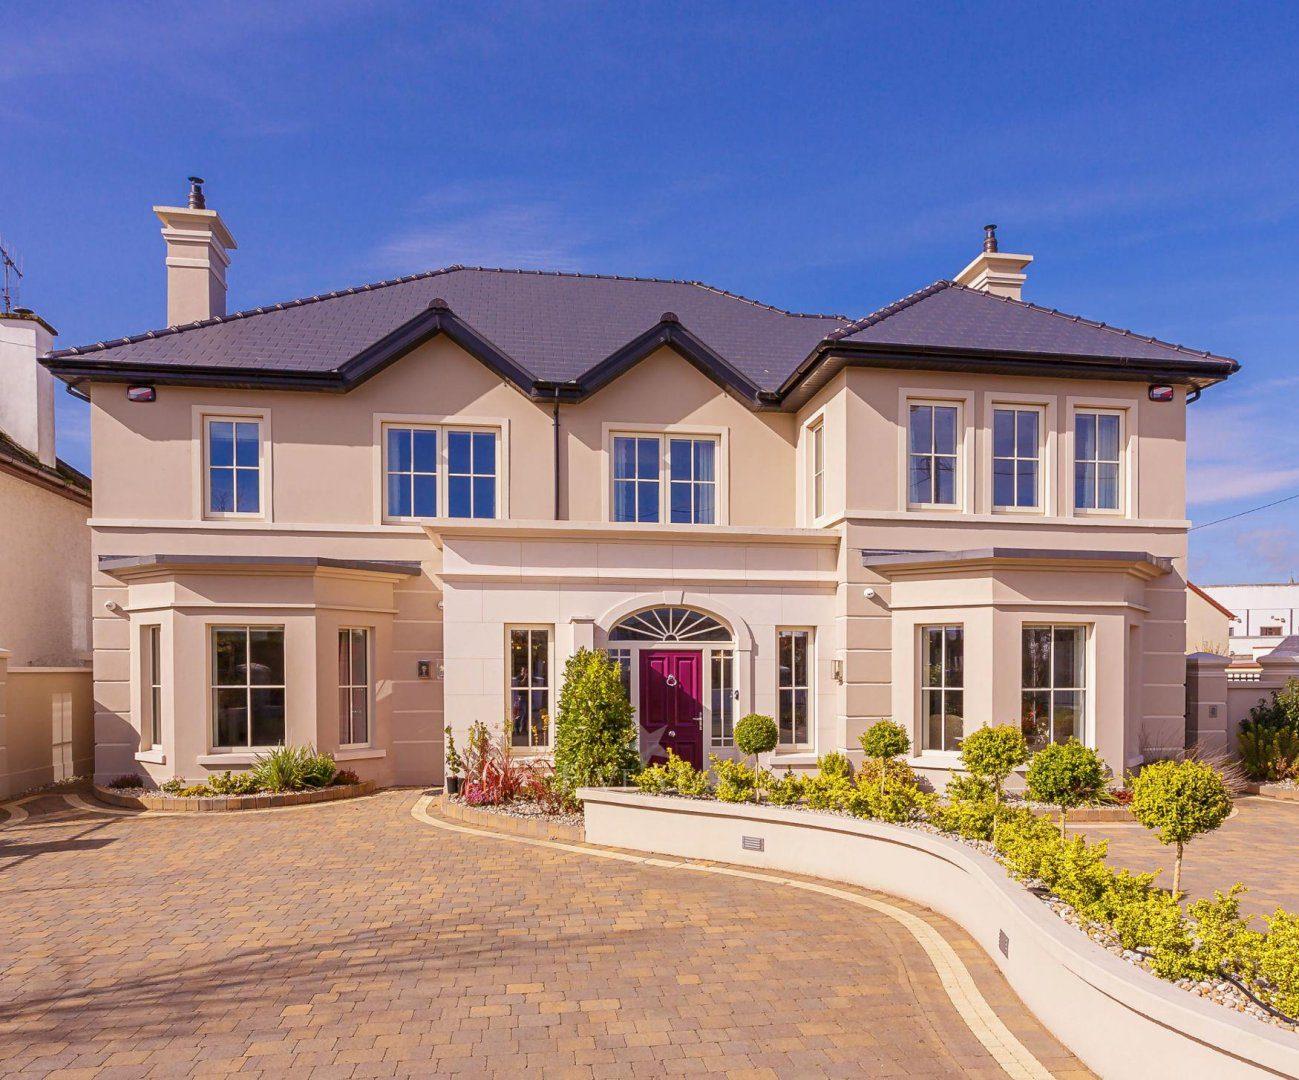 5-Star Killarney Residence photo 3